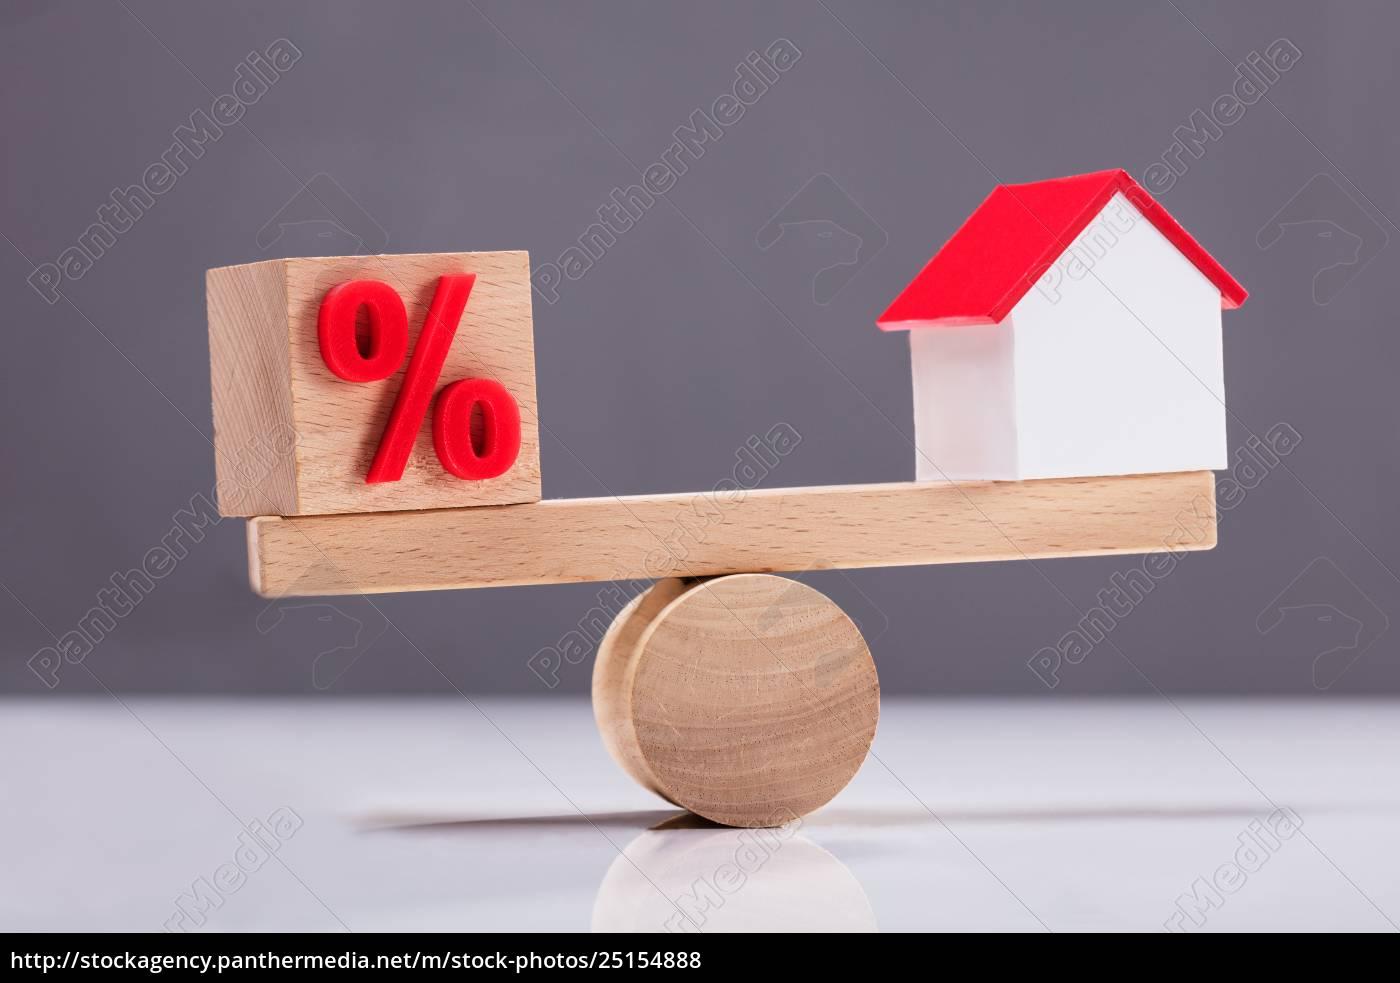 seesaw, showing, balance, between, percentage, symbol - 25154888